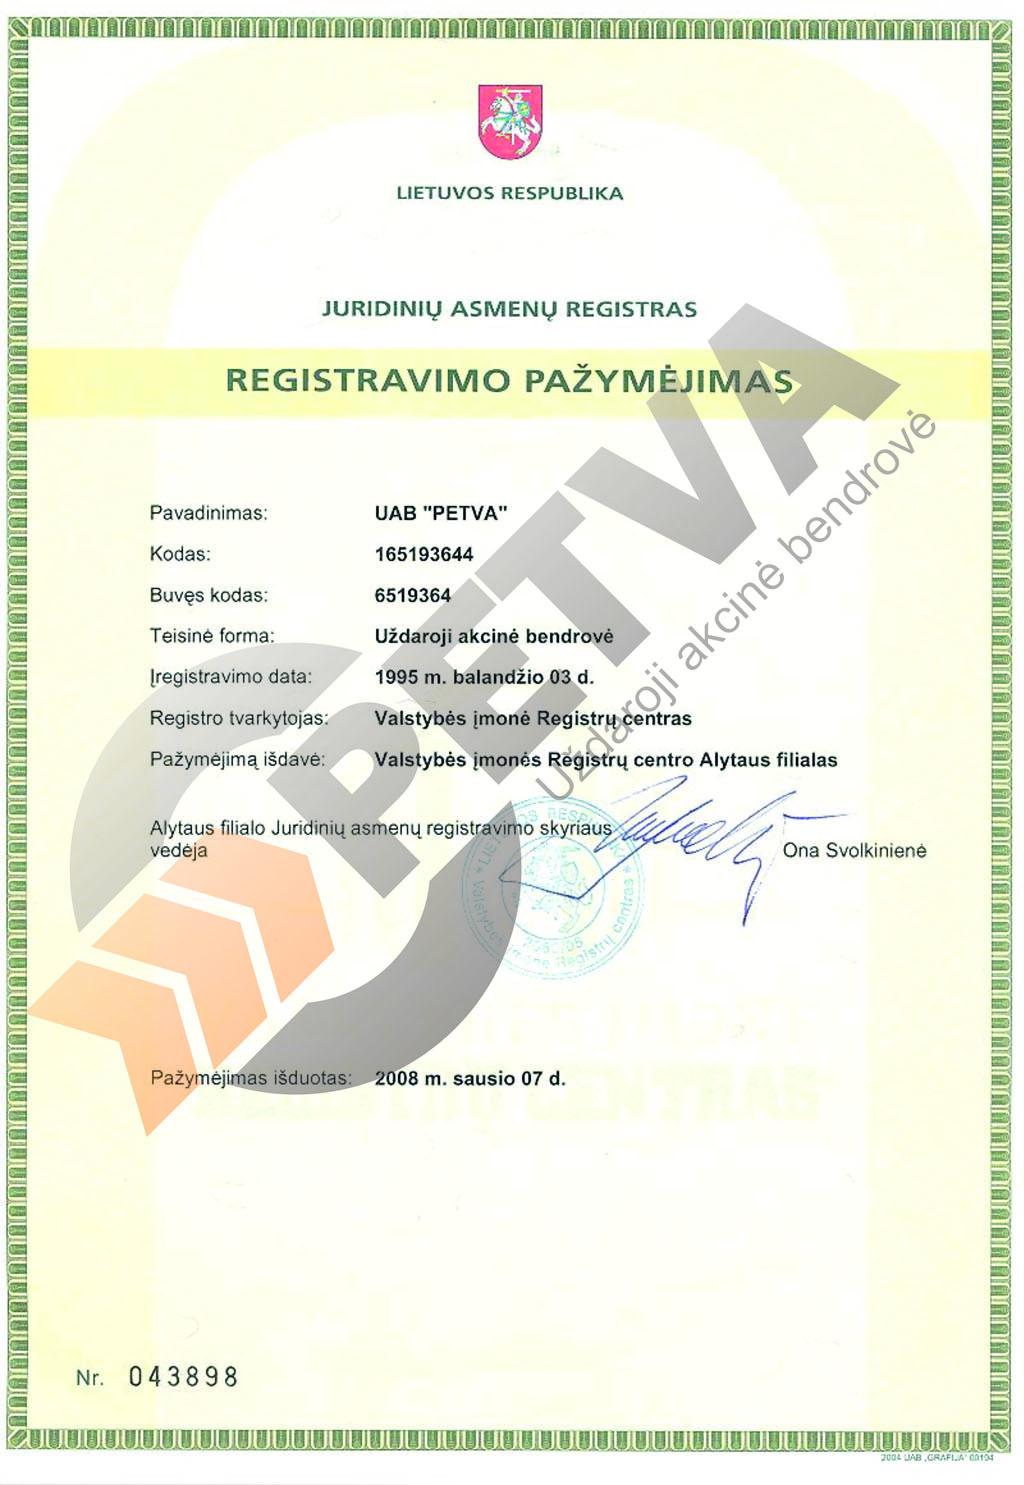 petva_registration